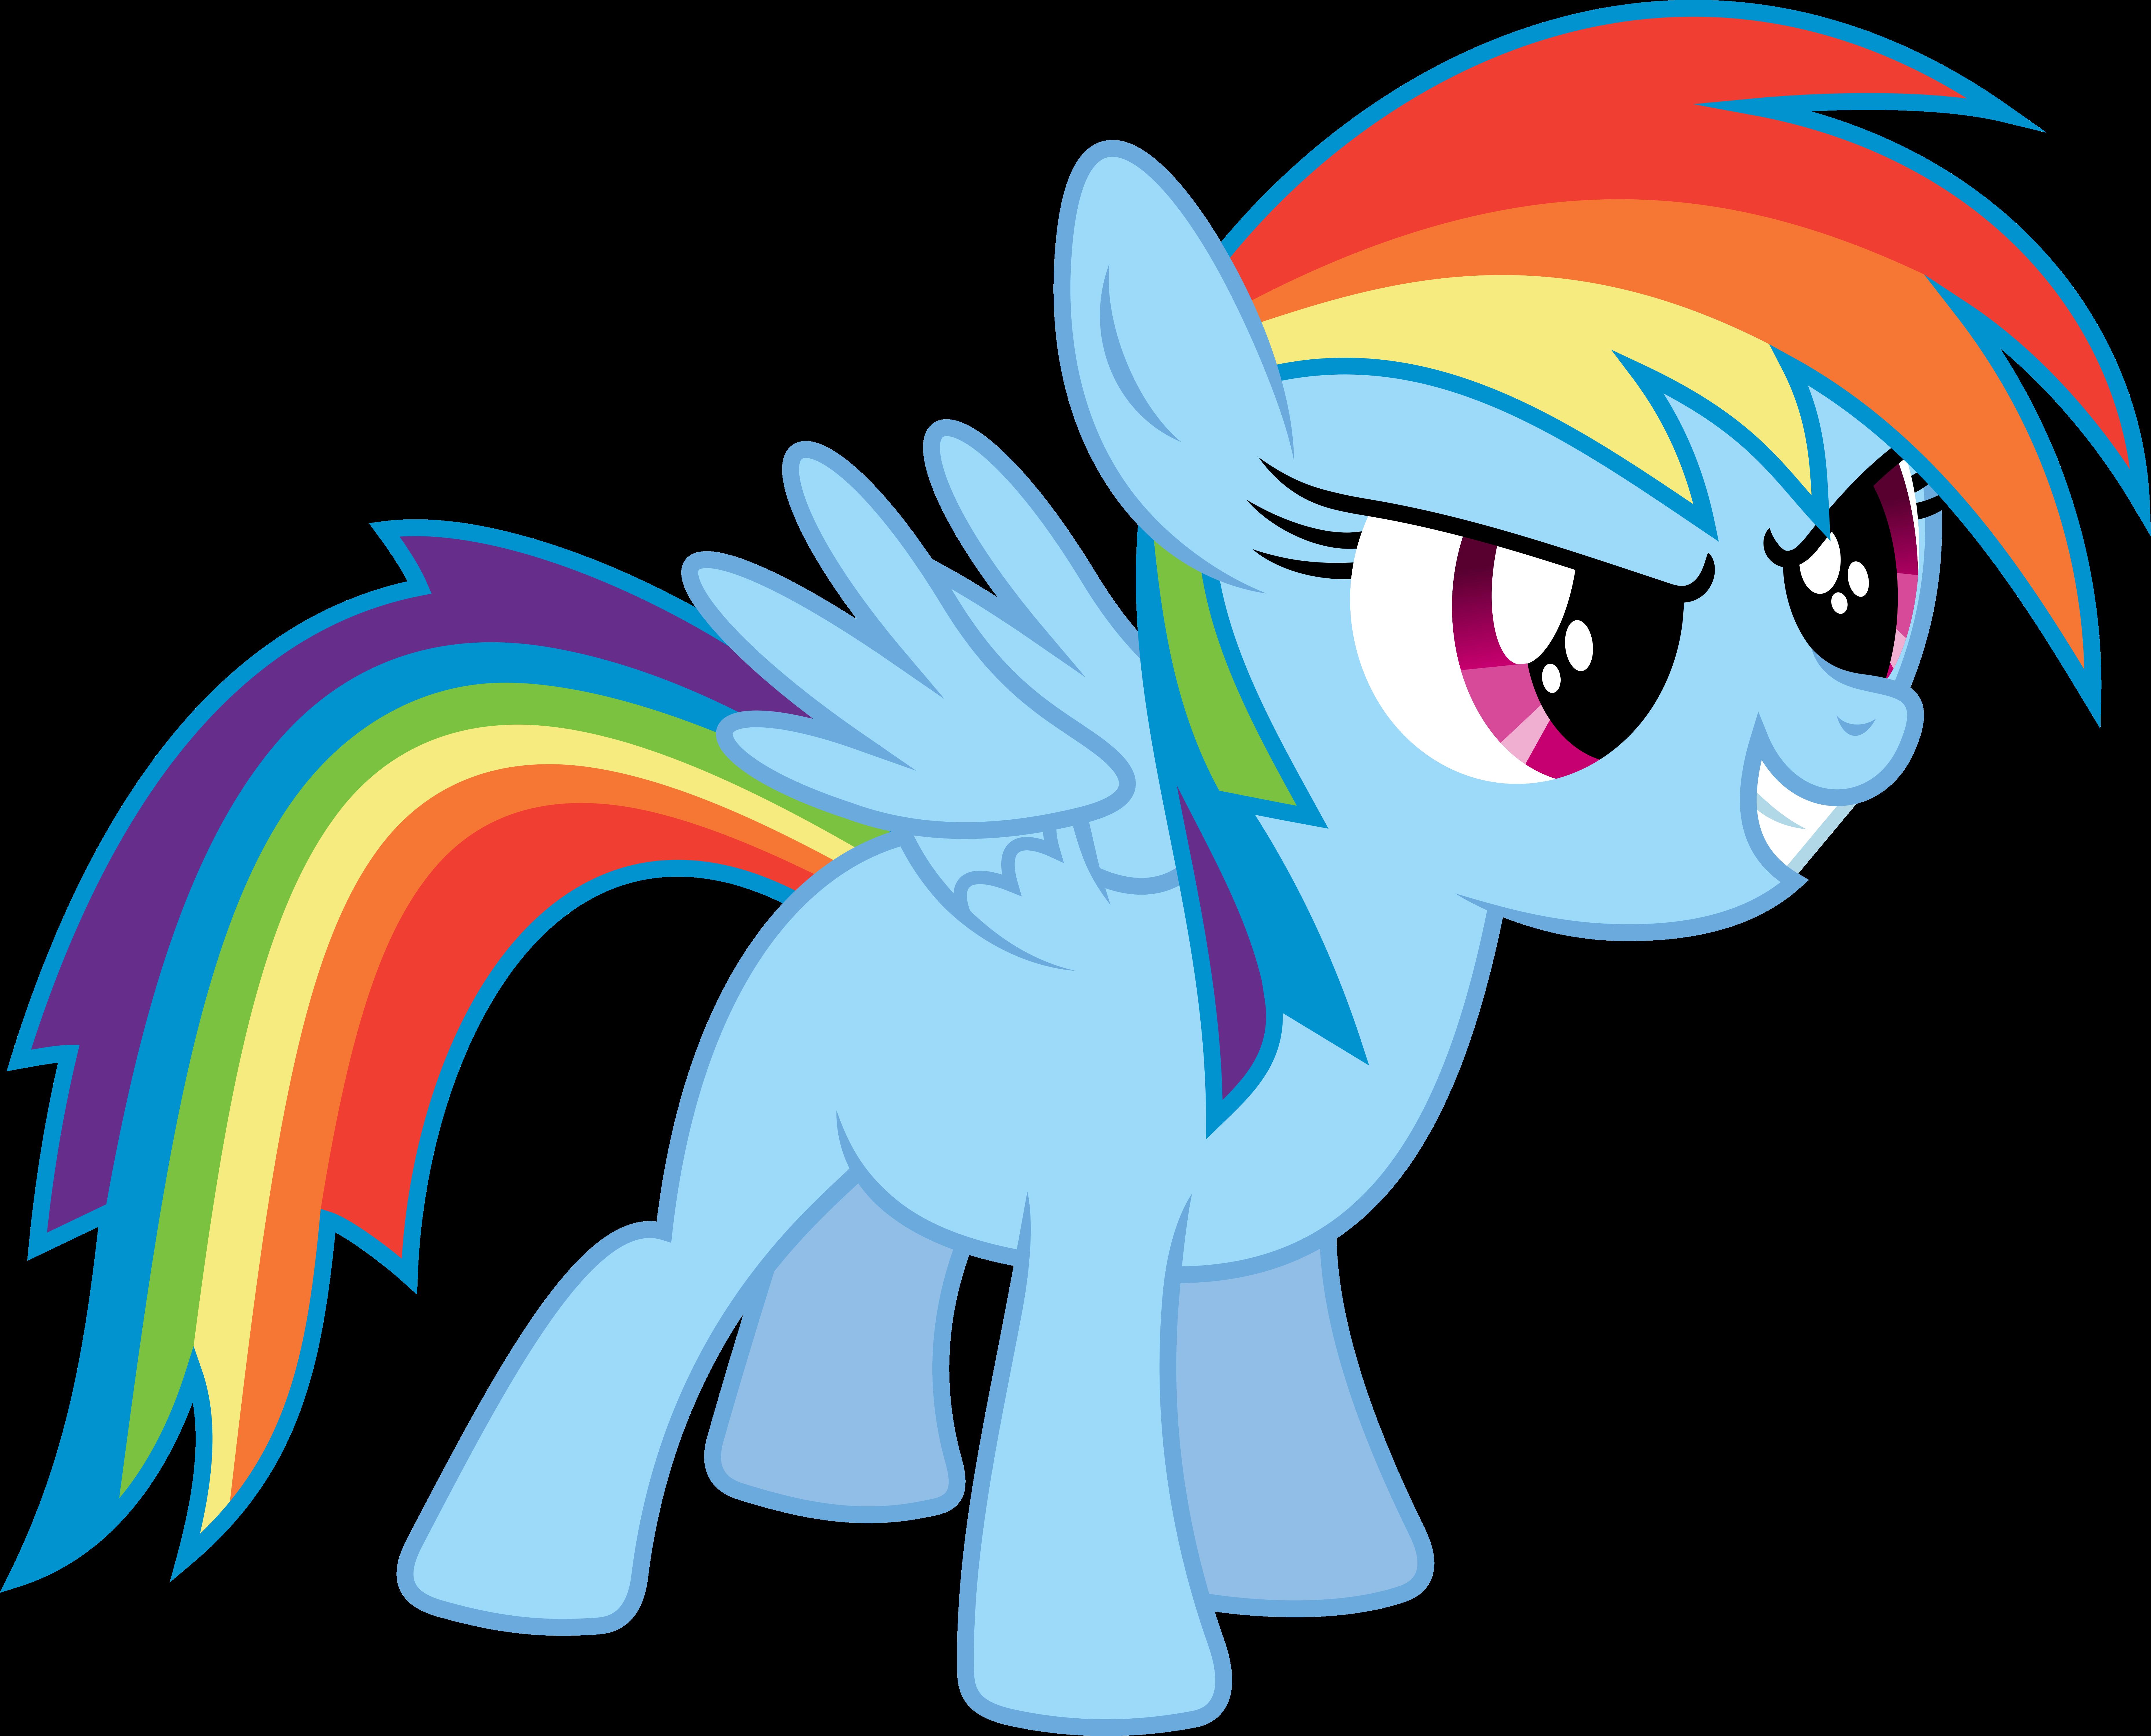 Rainbow Dash Filly by imageconstructor on DeviantArt